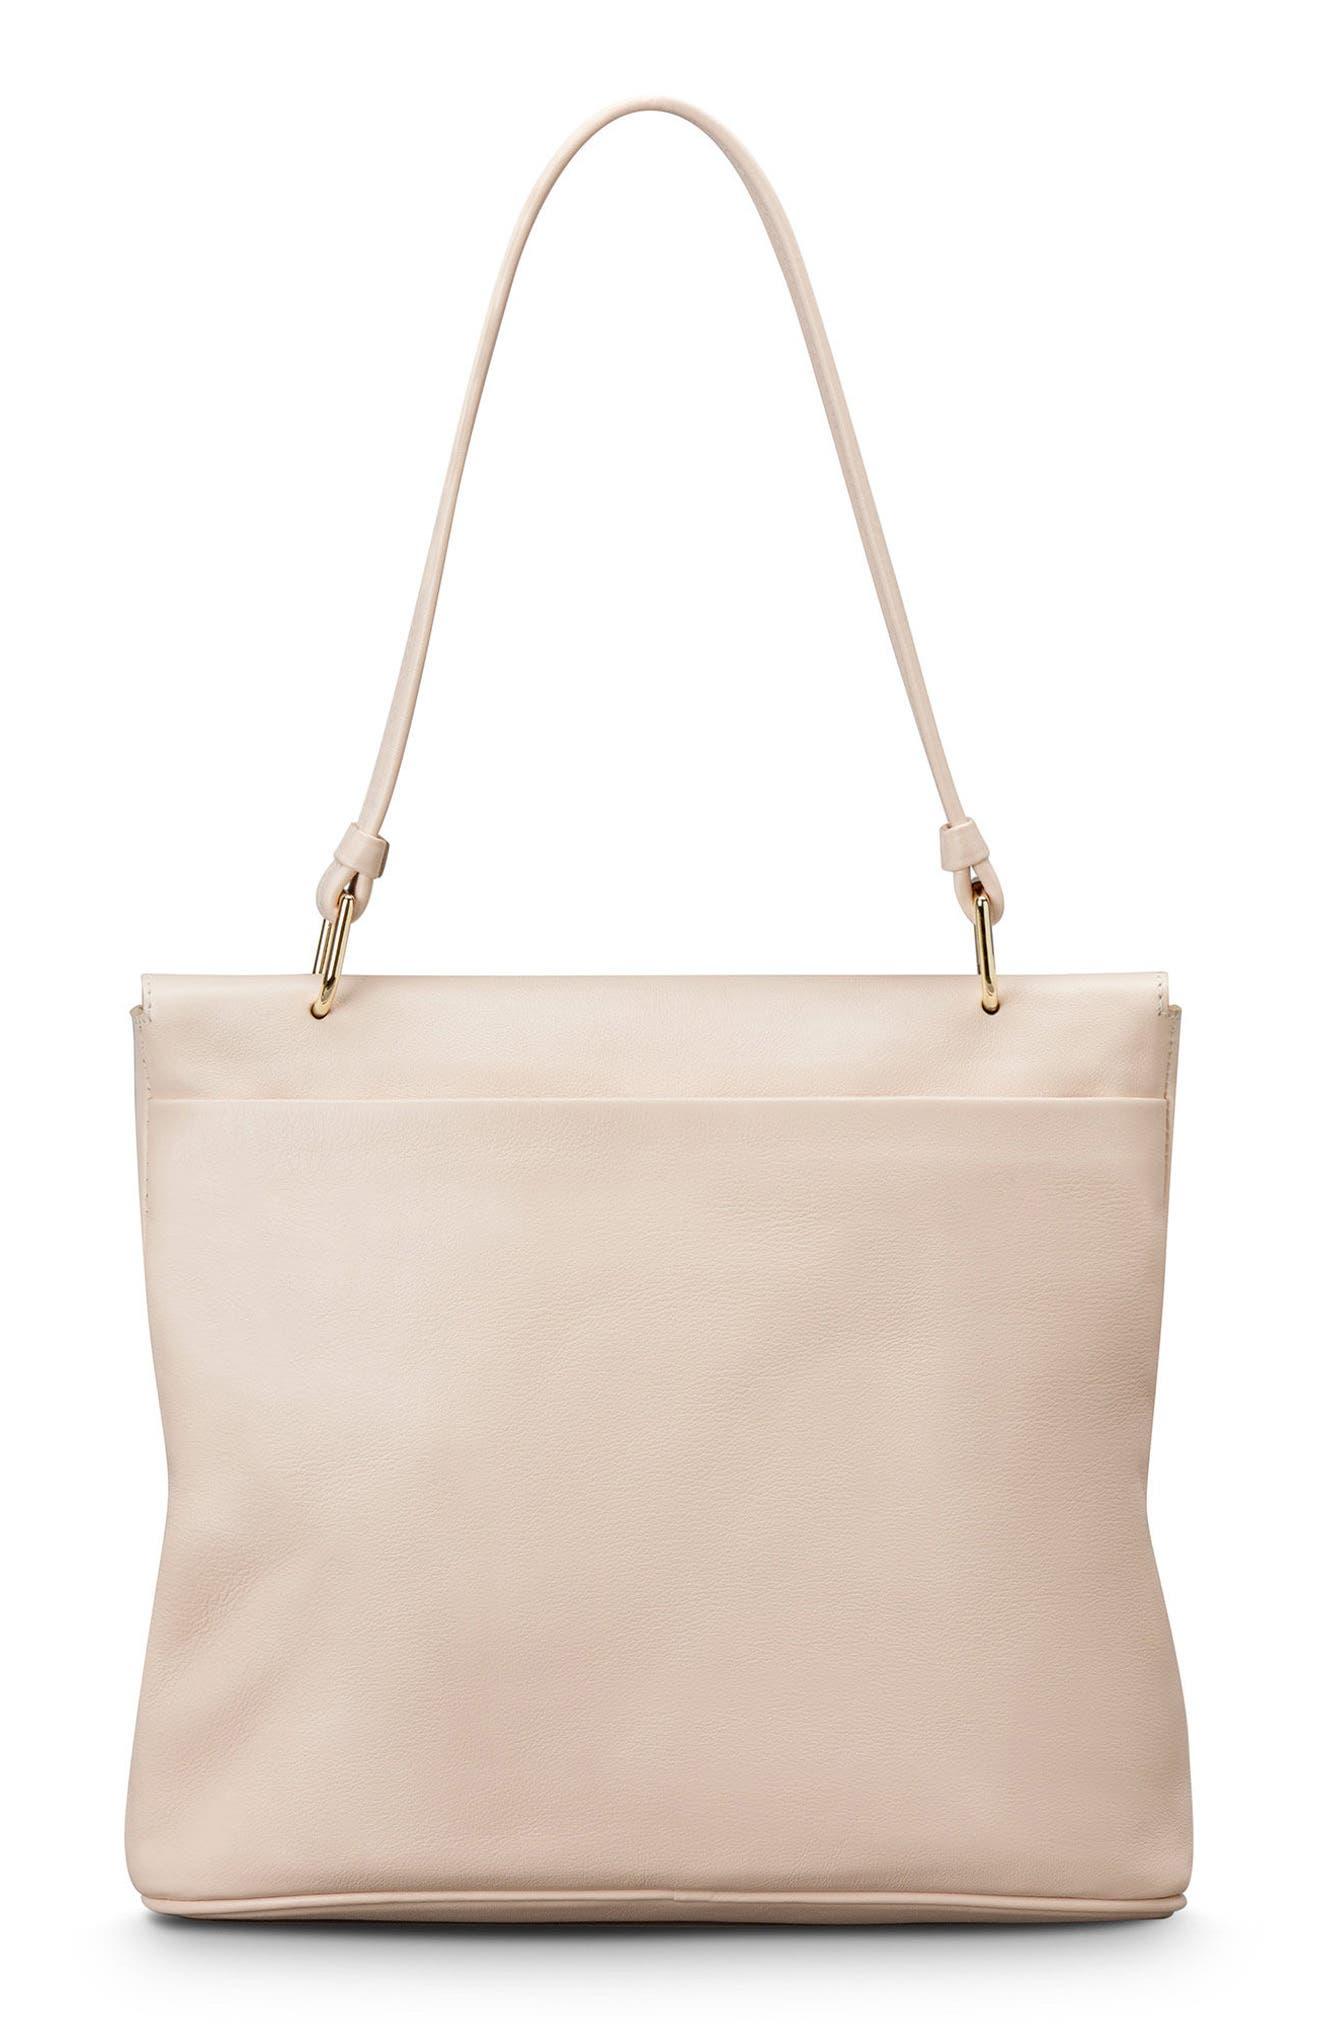 Birdy Leather Shoulder Bag,                             Alternate thumbnail 3, color,                             SOFT BLUSH